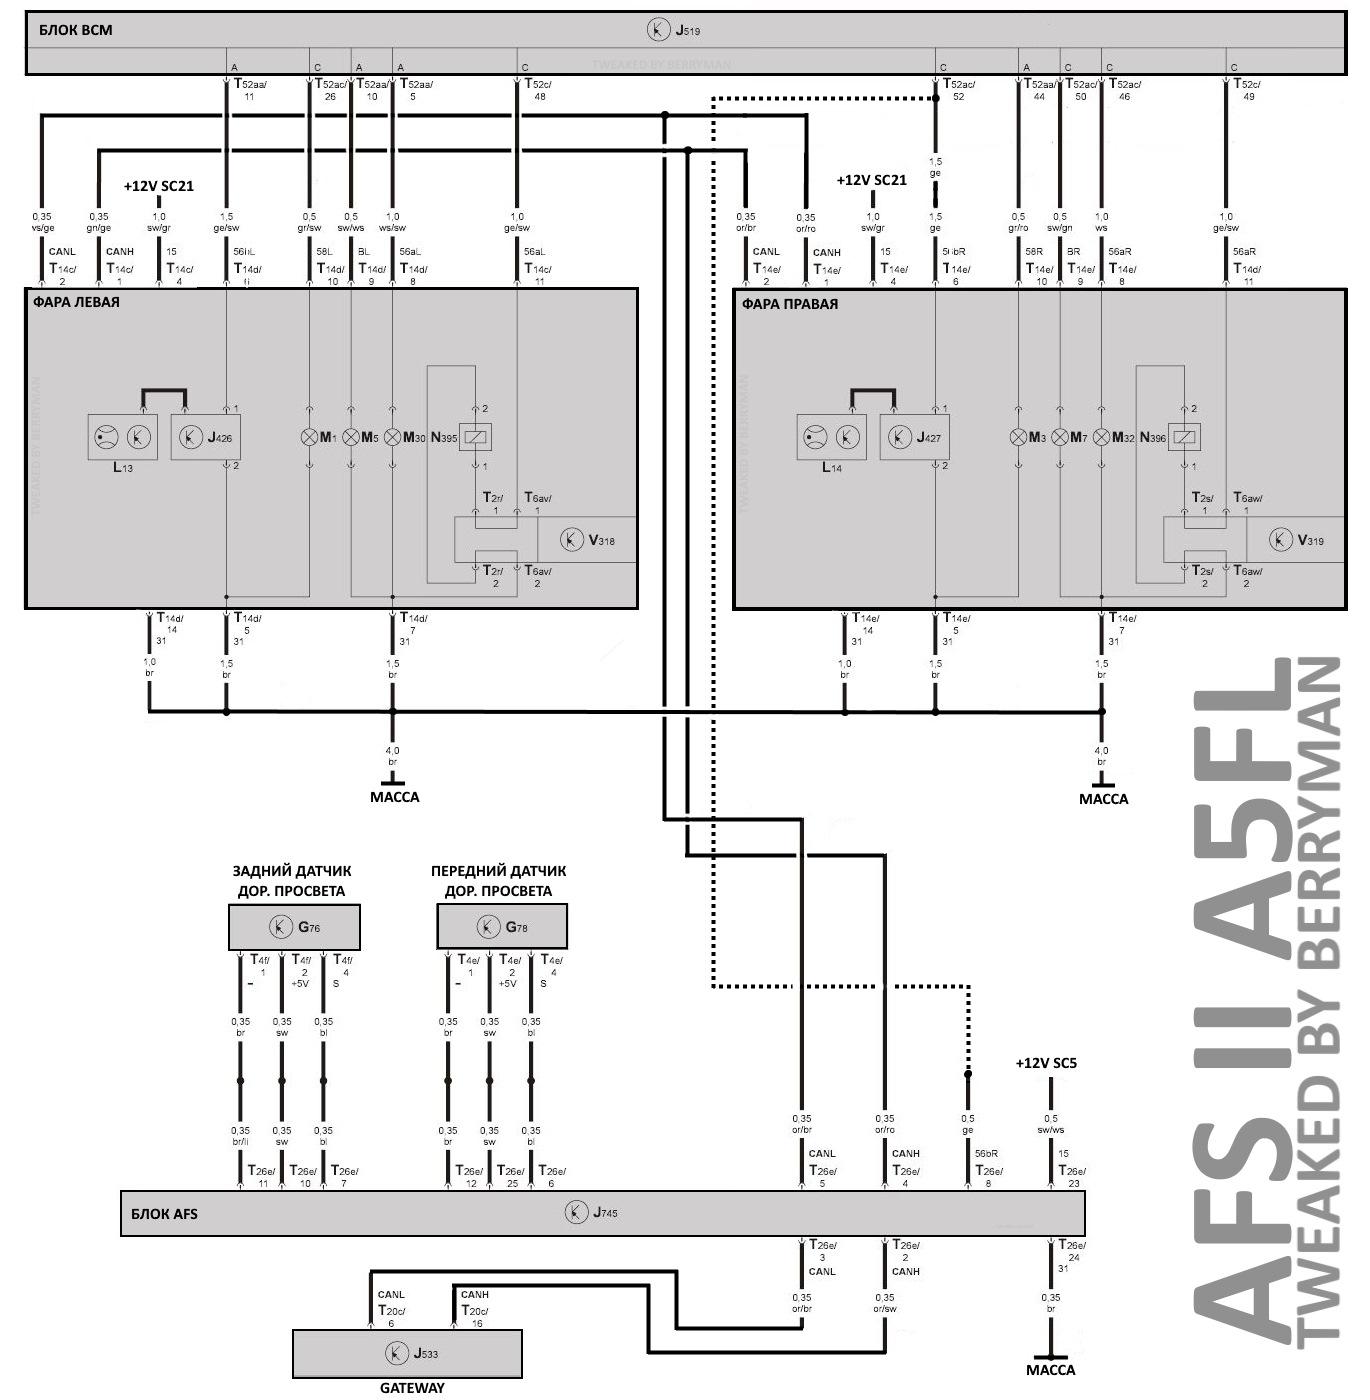 hight resolution of skoda octavia vrs wiring diagram wiring library o2flafs thumb jpg 953d3fa94daa2aea2f6f6e50db652991 jpg fl xenon retrofit skoda